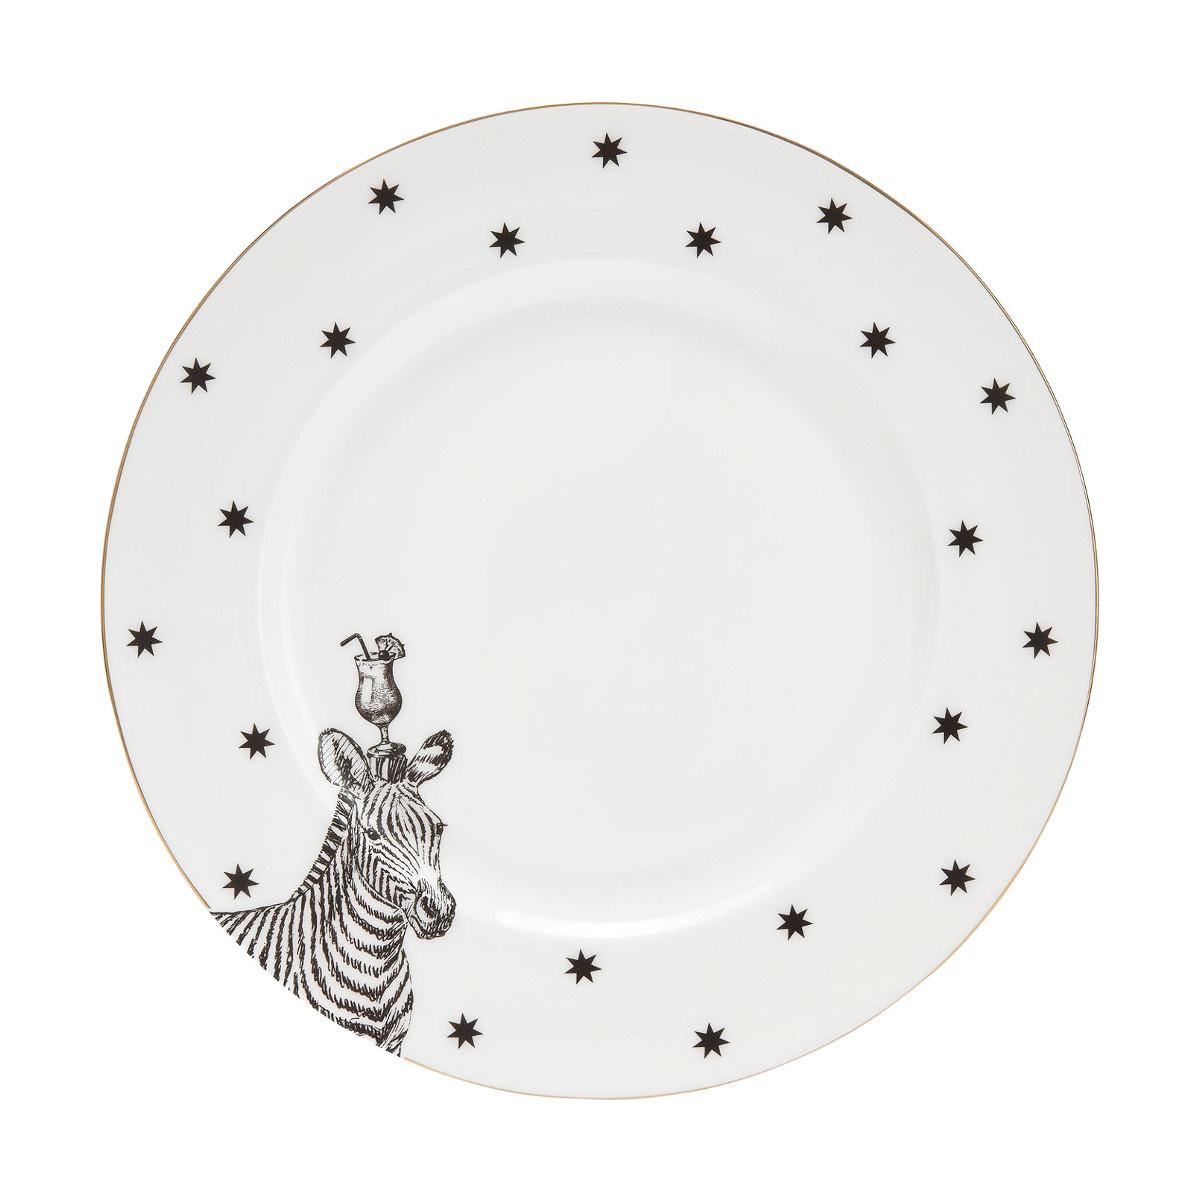 Yvonne Ellen London Monochrome 2-er Set Teller Ø 26,5 cm - Zebra Motiv- Bone China Porzellan